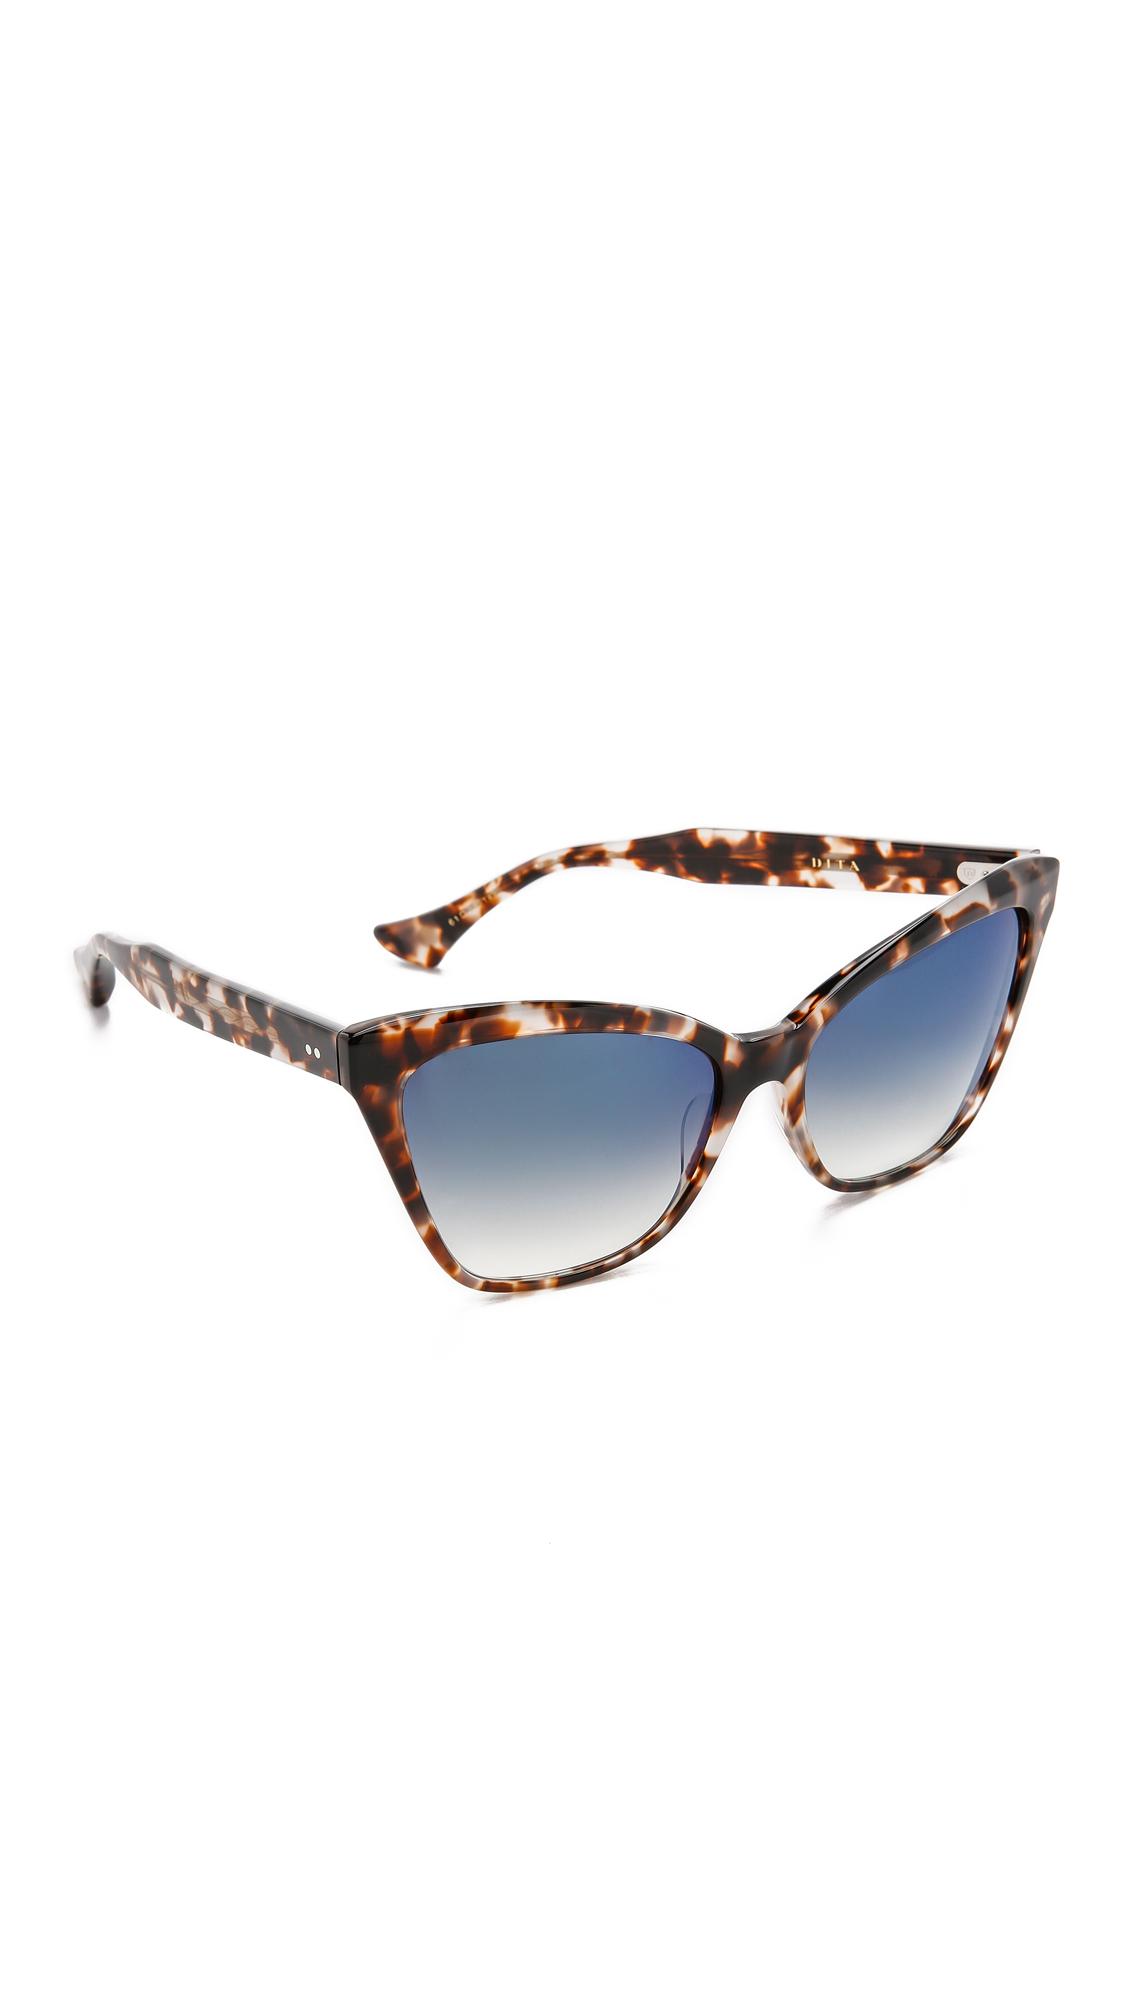 Dita Eyewear Superstition Sunglasses - Cream Tortoise/blue Flash in Natural